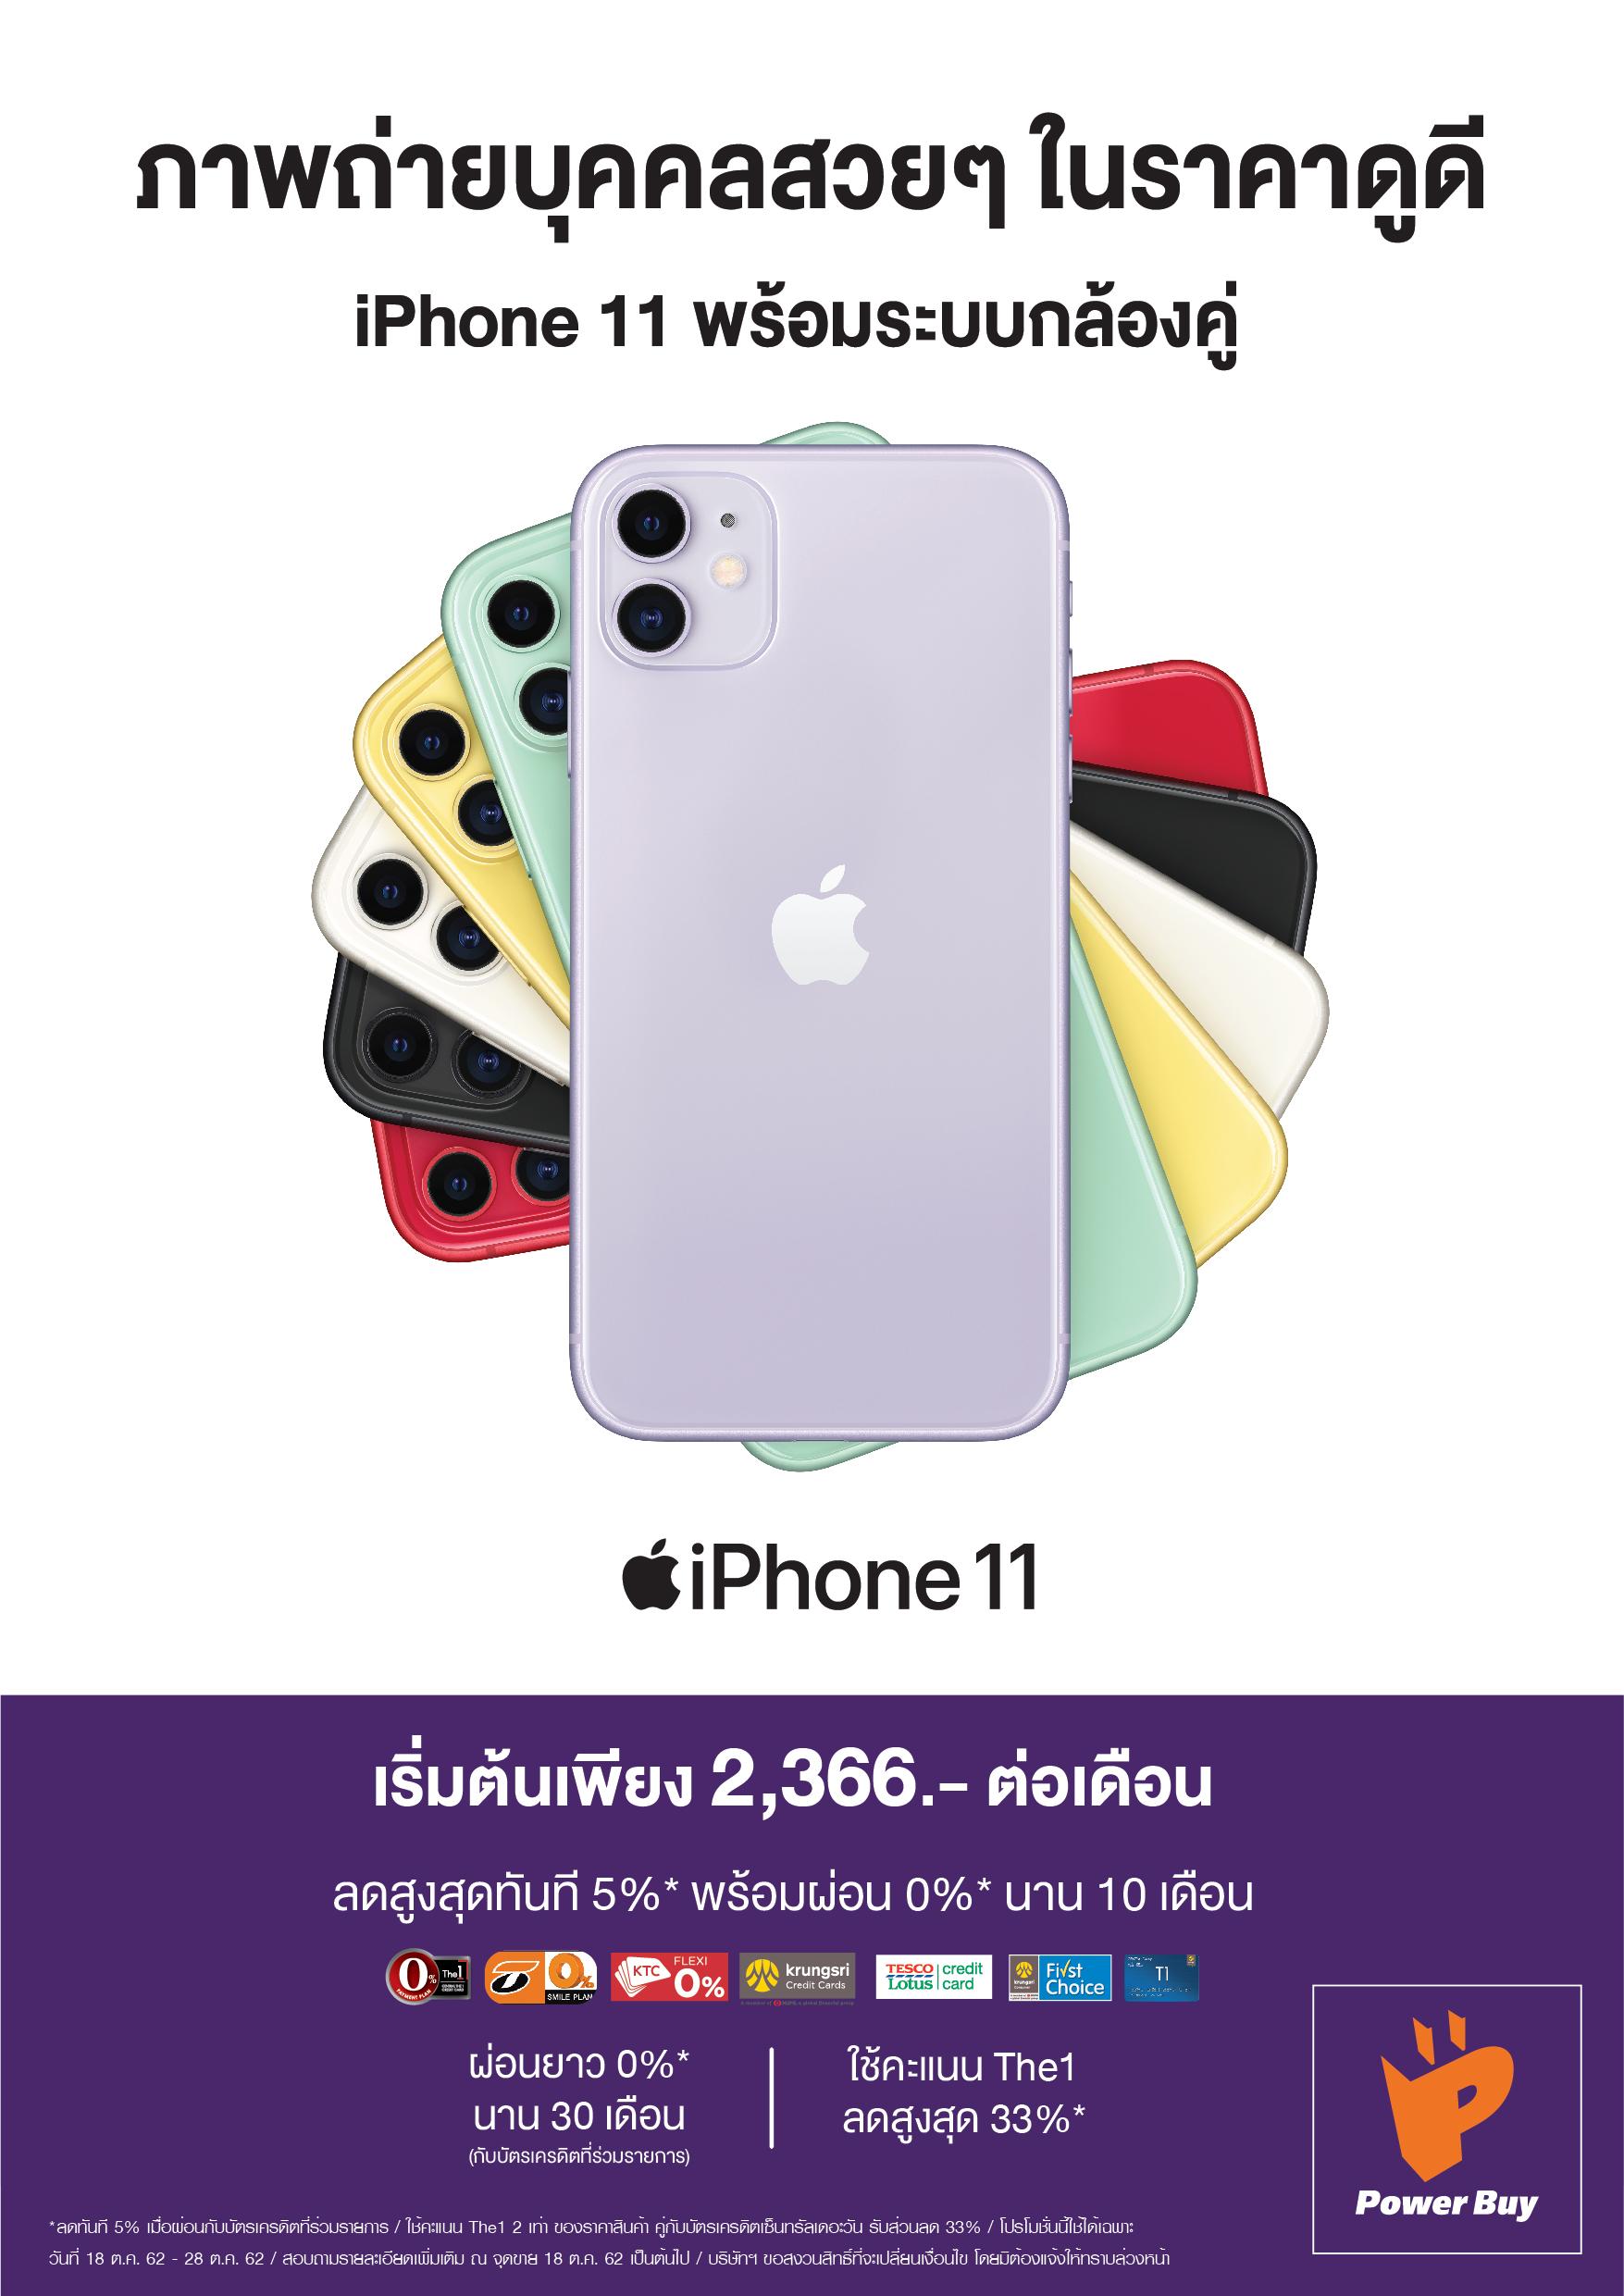 PWB_iPhone 11 _Pre-order photo 2